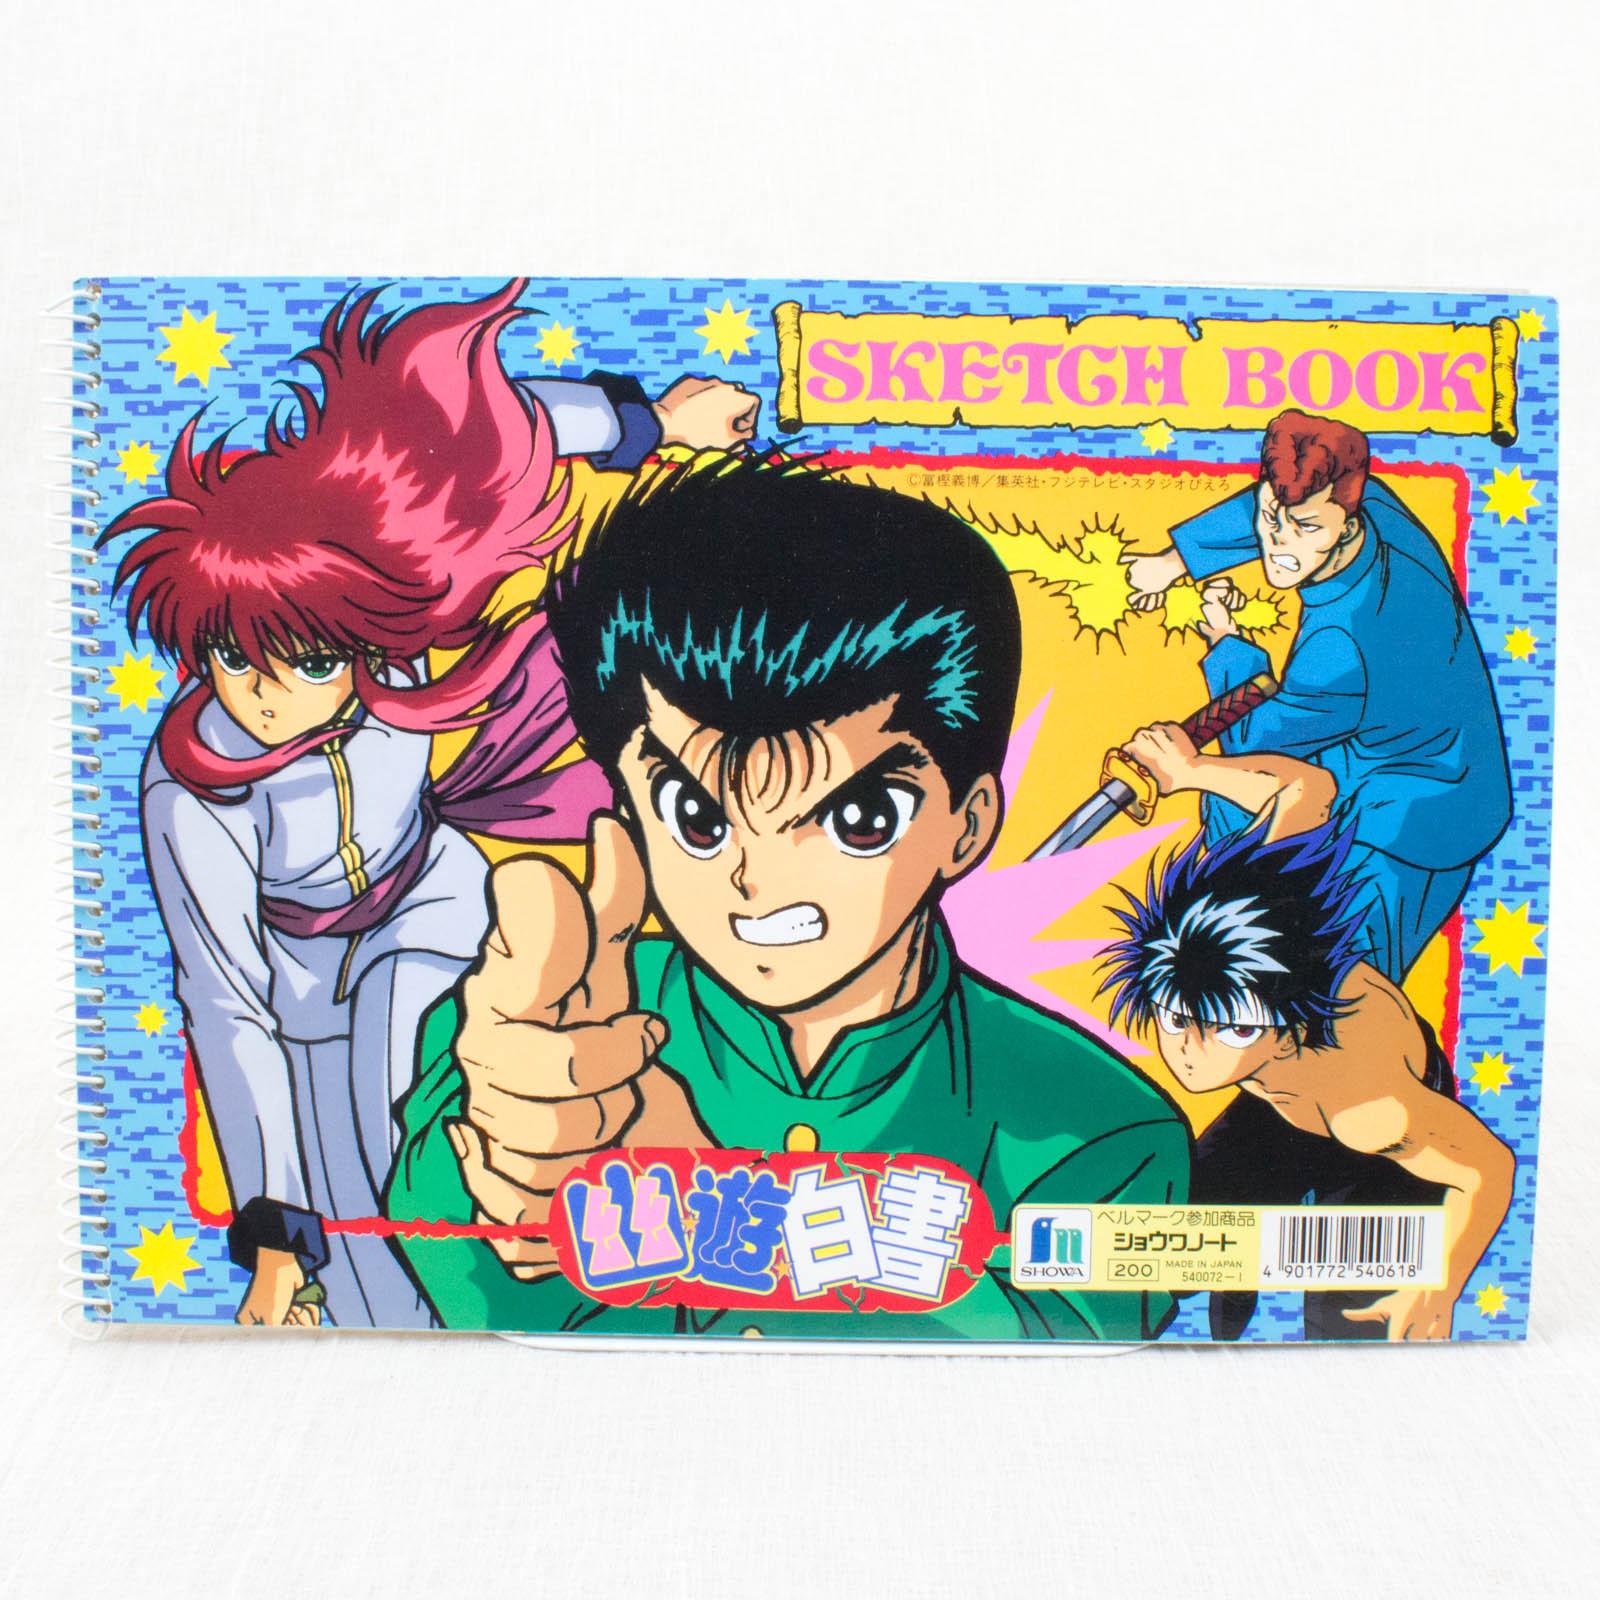 Retro Yu Yu Hakusho Sketch Book 7x10 inch Showa Note JAPAN ANIME MANGA